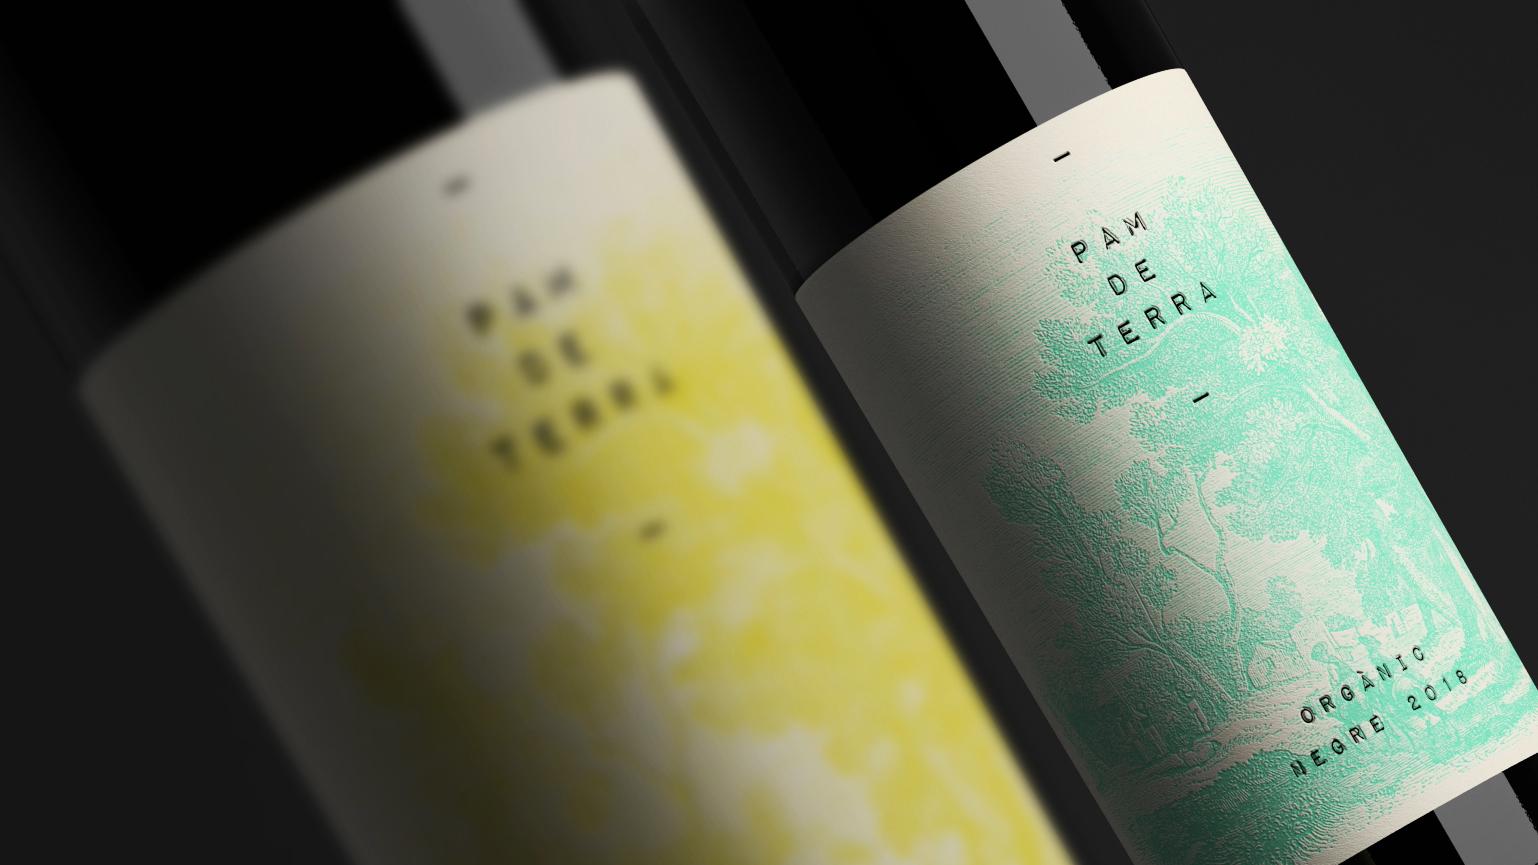 Pam De Terra, Exclusive Organic Wines Designed by Brava Collective